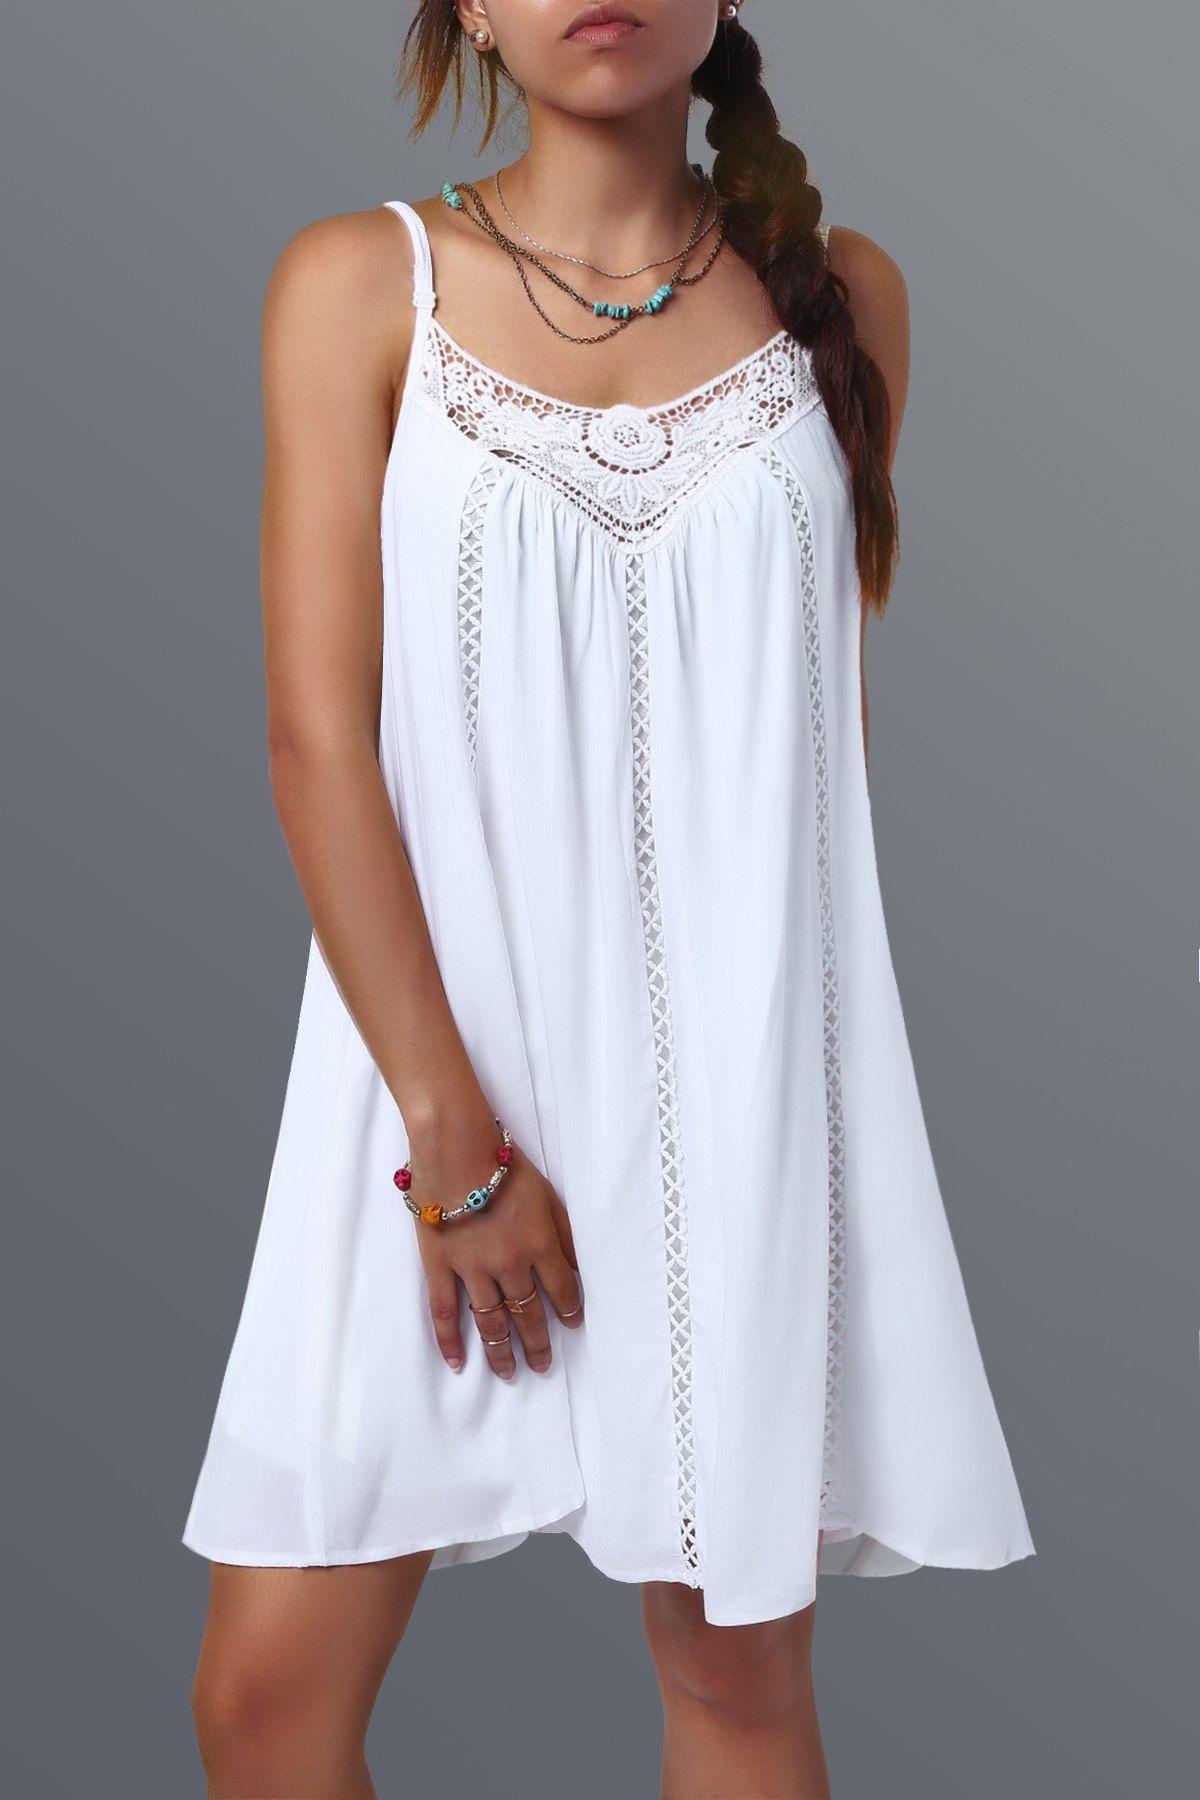 2019 year style- Wear you Trendswould a peekaboo lace dress